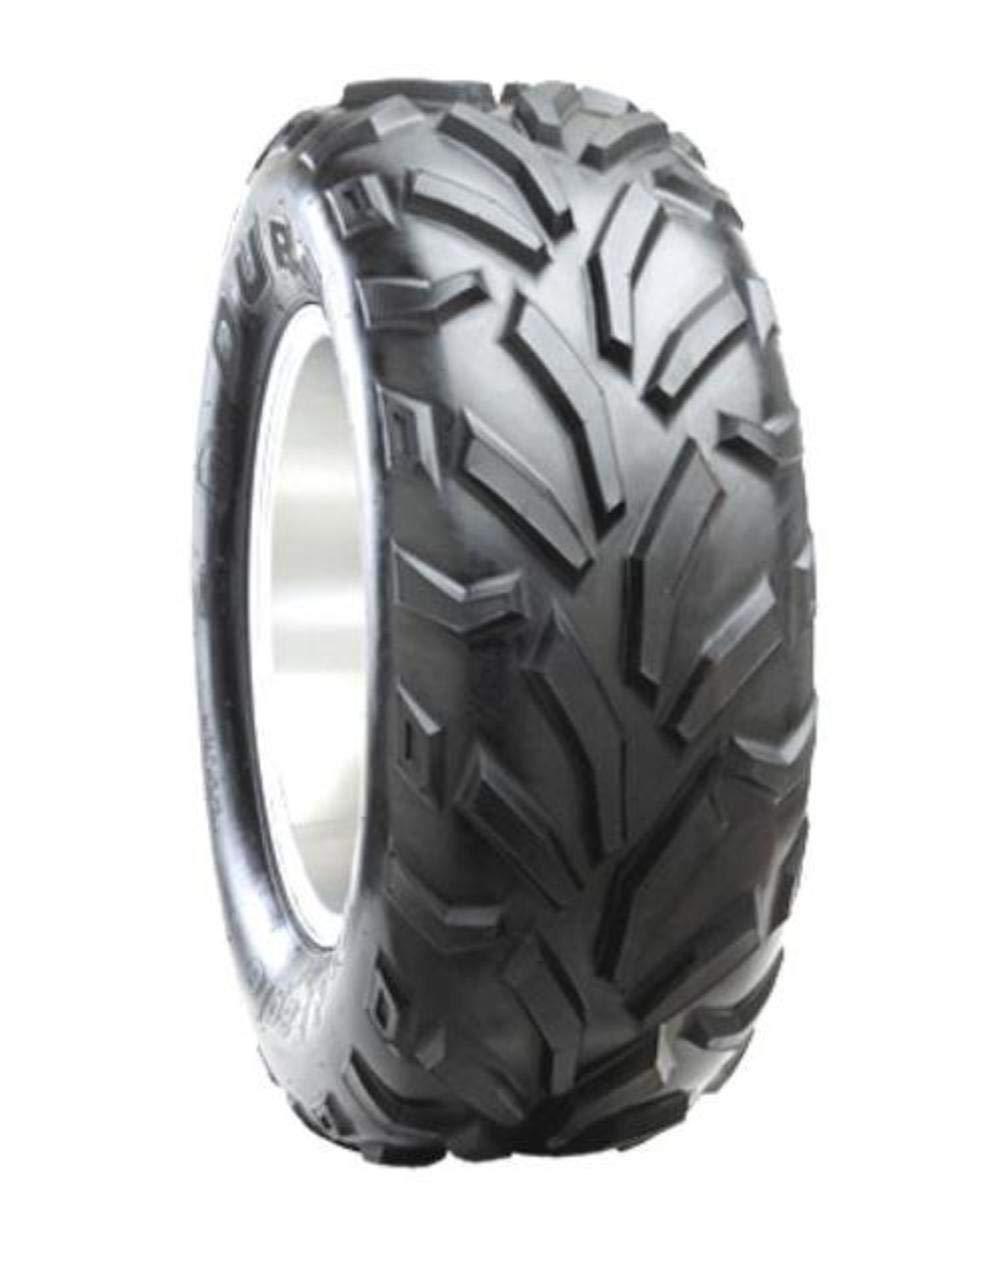 Tire Size: 26x12x14 26x12Rx14 Tire Ply: 4 Tire Type: ATV//UTV Tire Construction: Radial 31-201314-2612B Position: Front//Rear Tire Application: All-Terrain Front//Rear Rim Size: 14 Duro DI2013 Red Eagle Tire